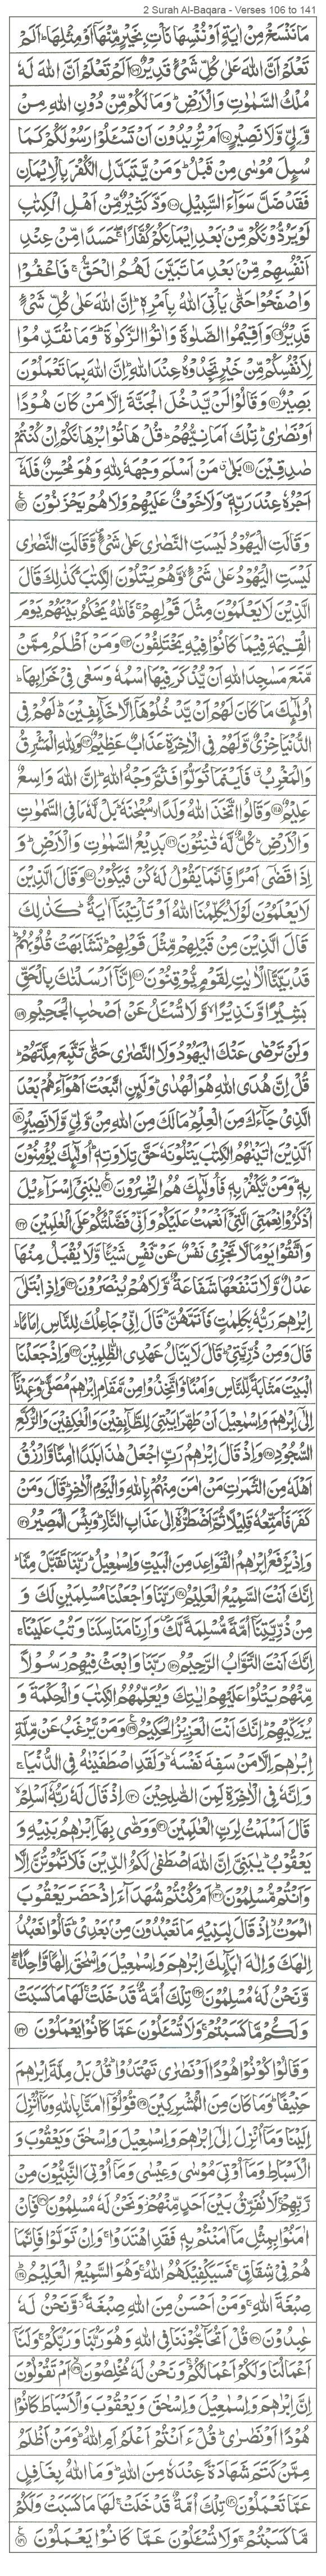 2 Surah Al-Baqara - Verses 106 to 141